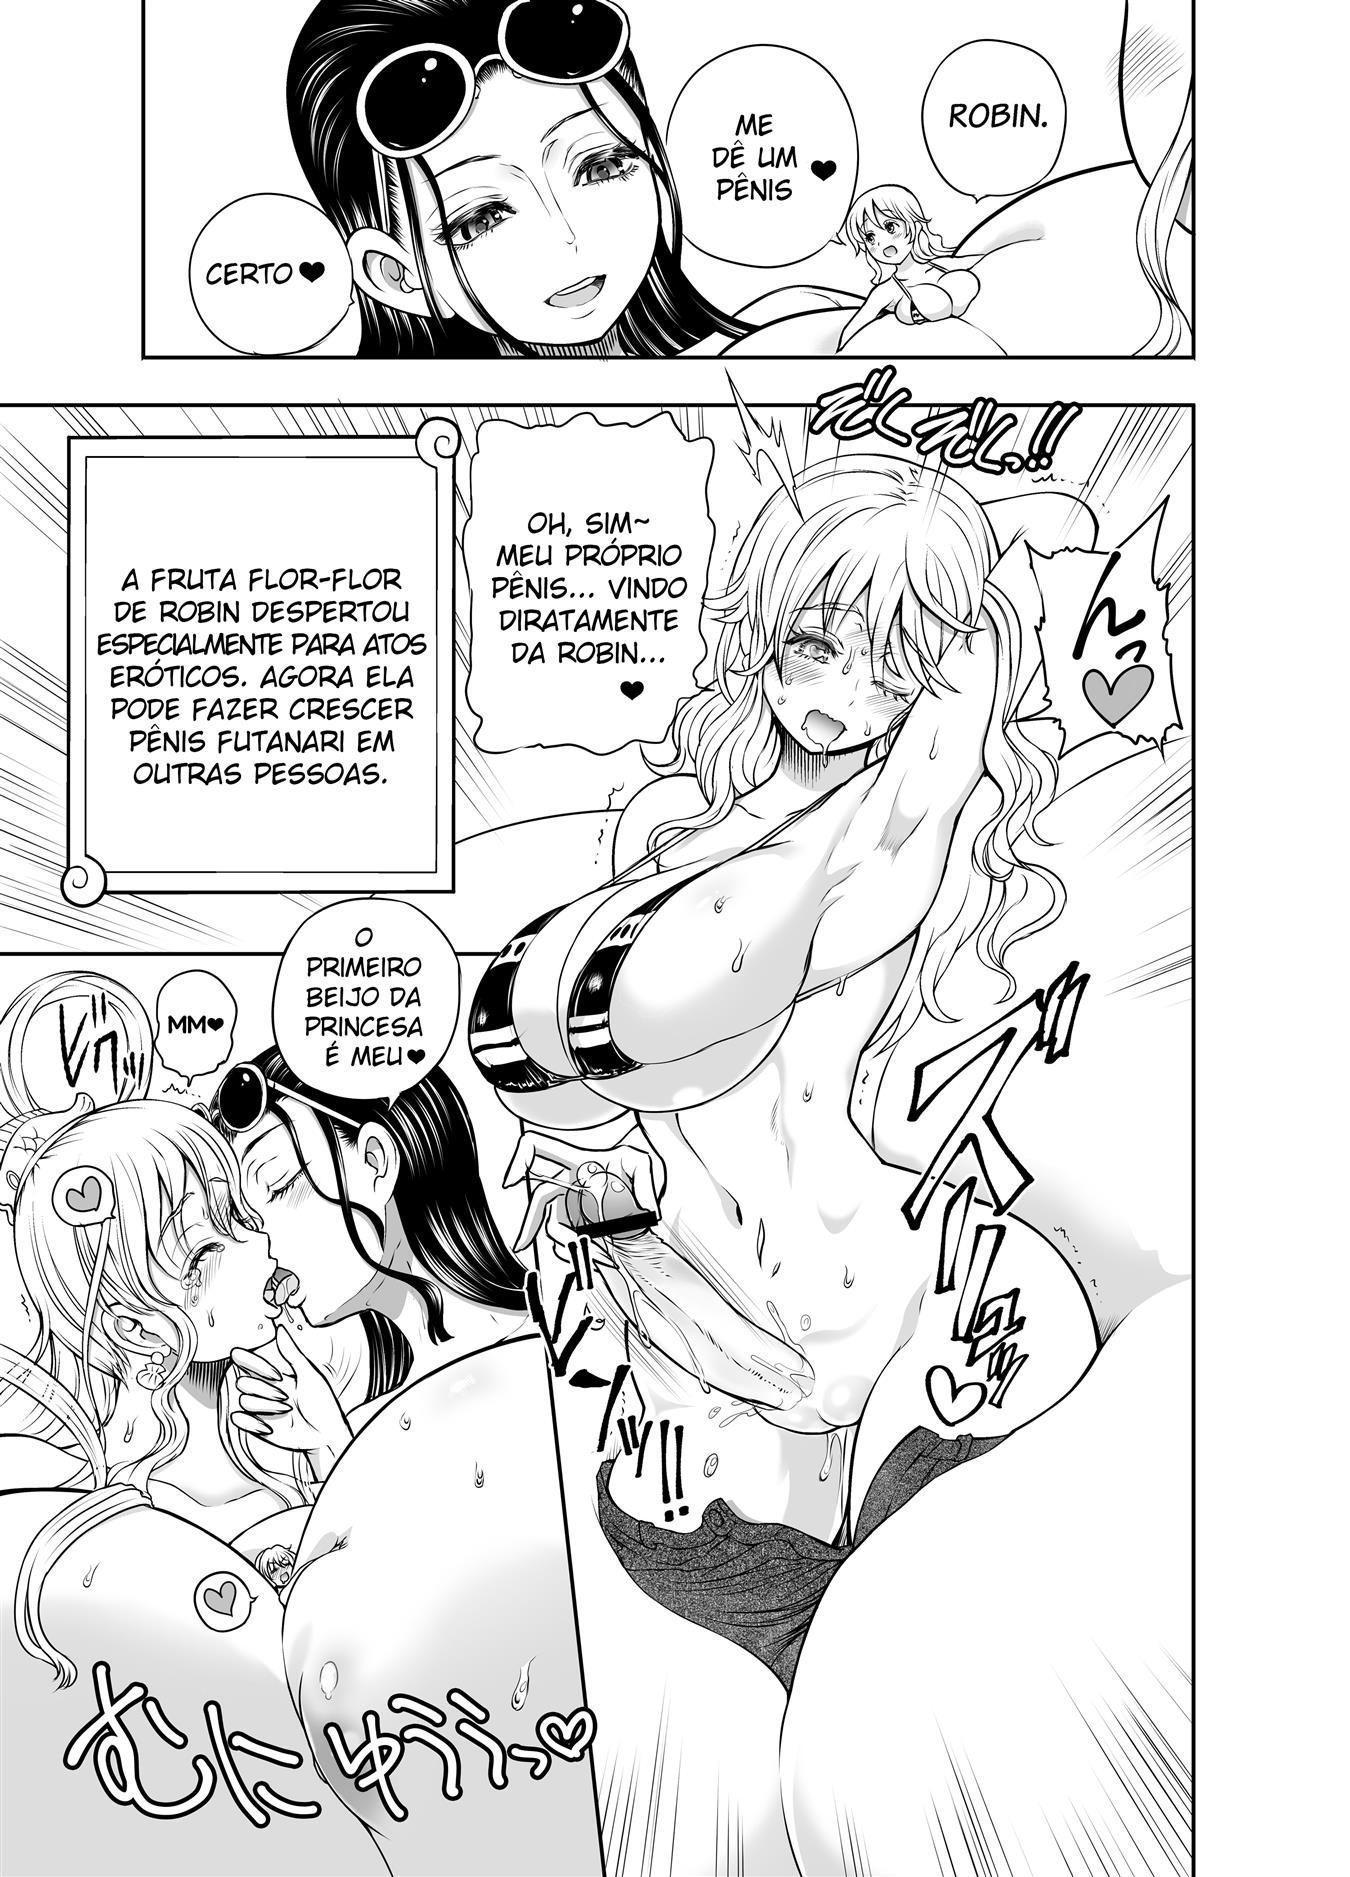 Deflorando à virgindade da princesa sereia Shirahoshi